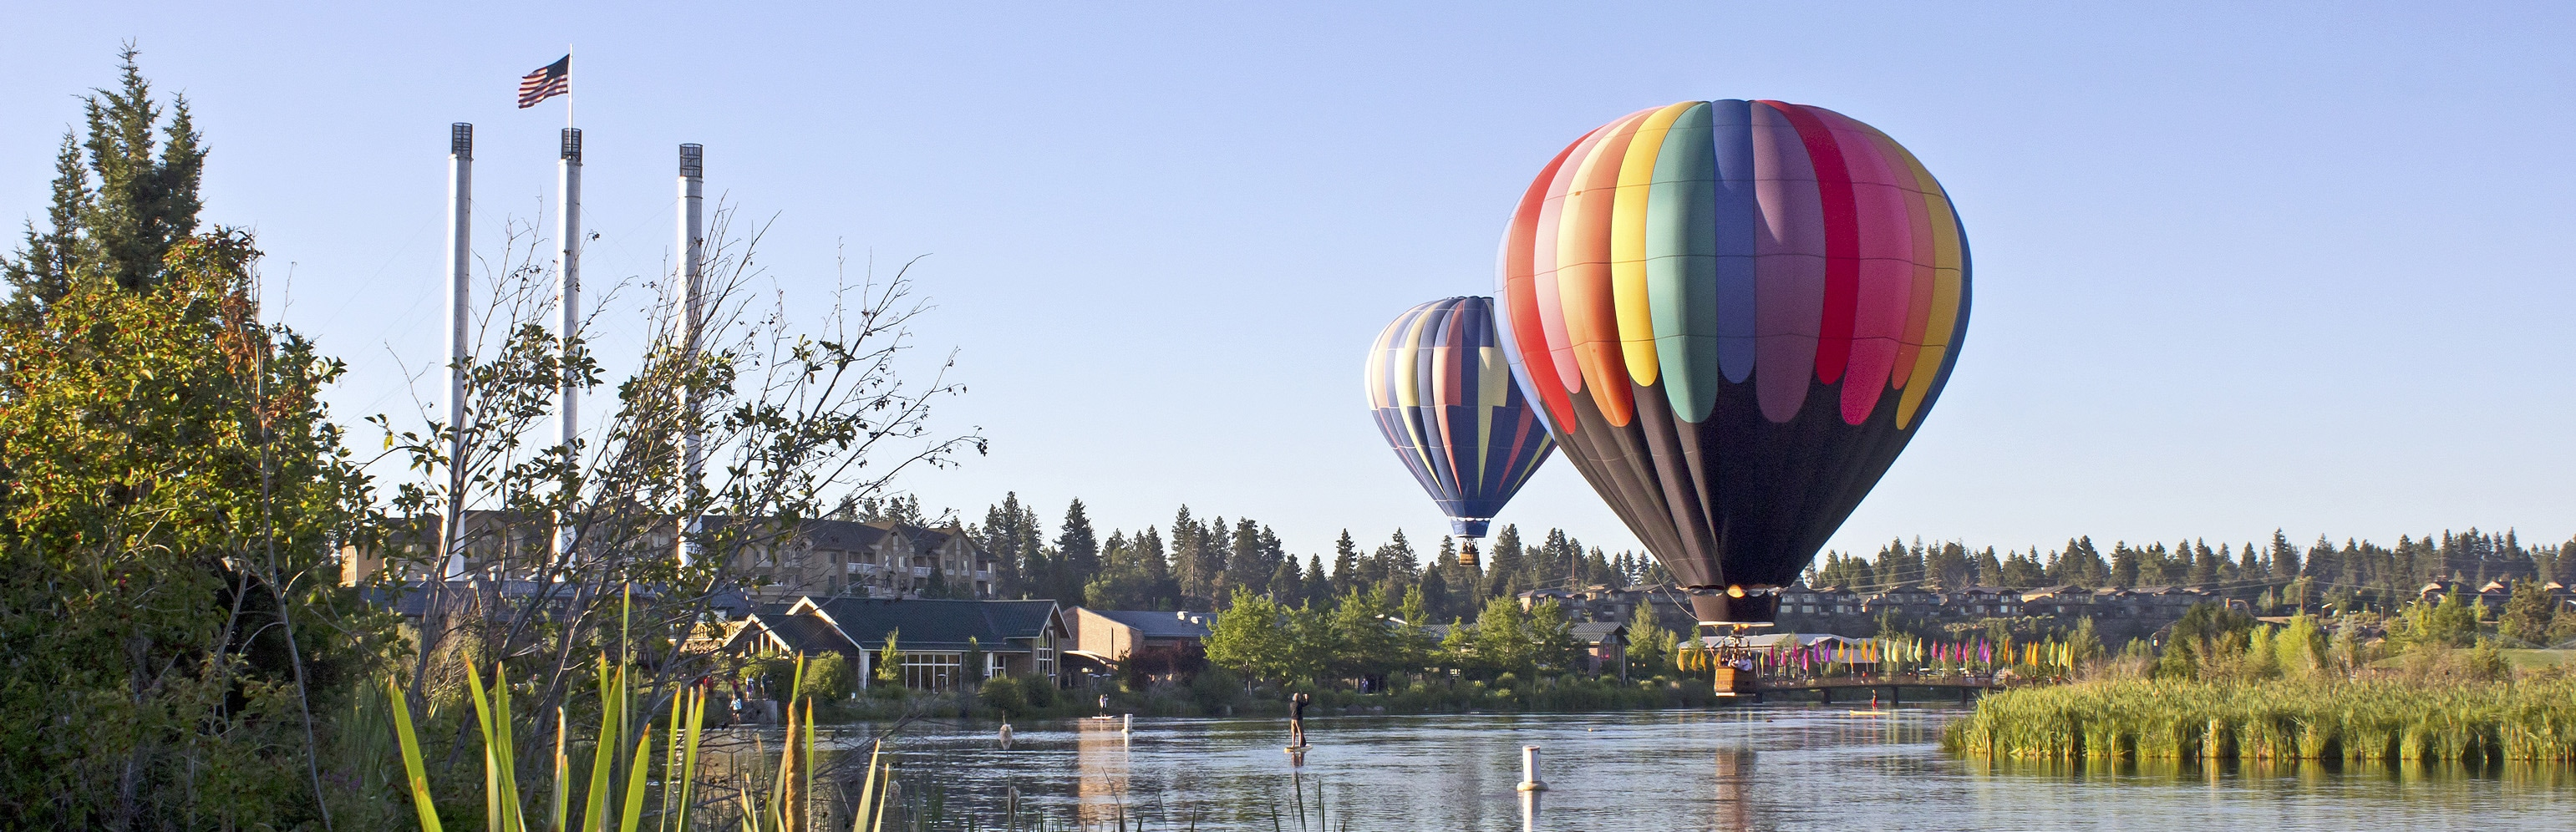 Oregon Coast For Sale By Owner Craigslist